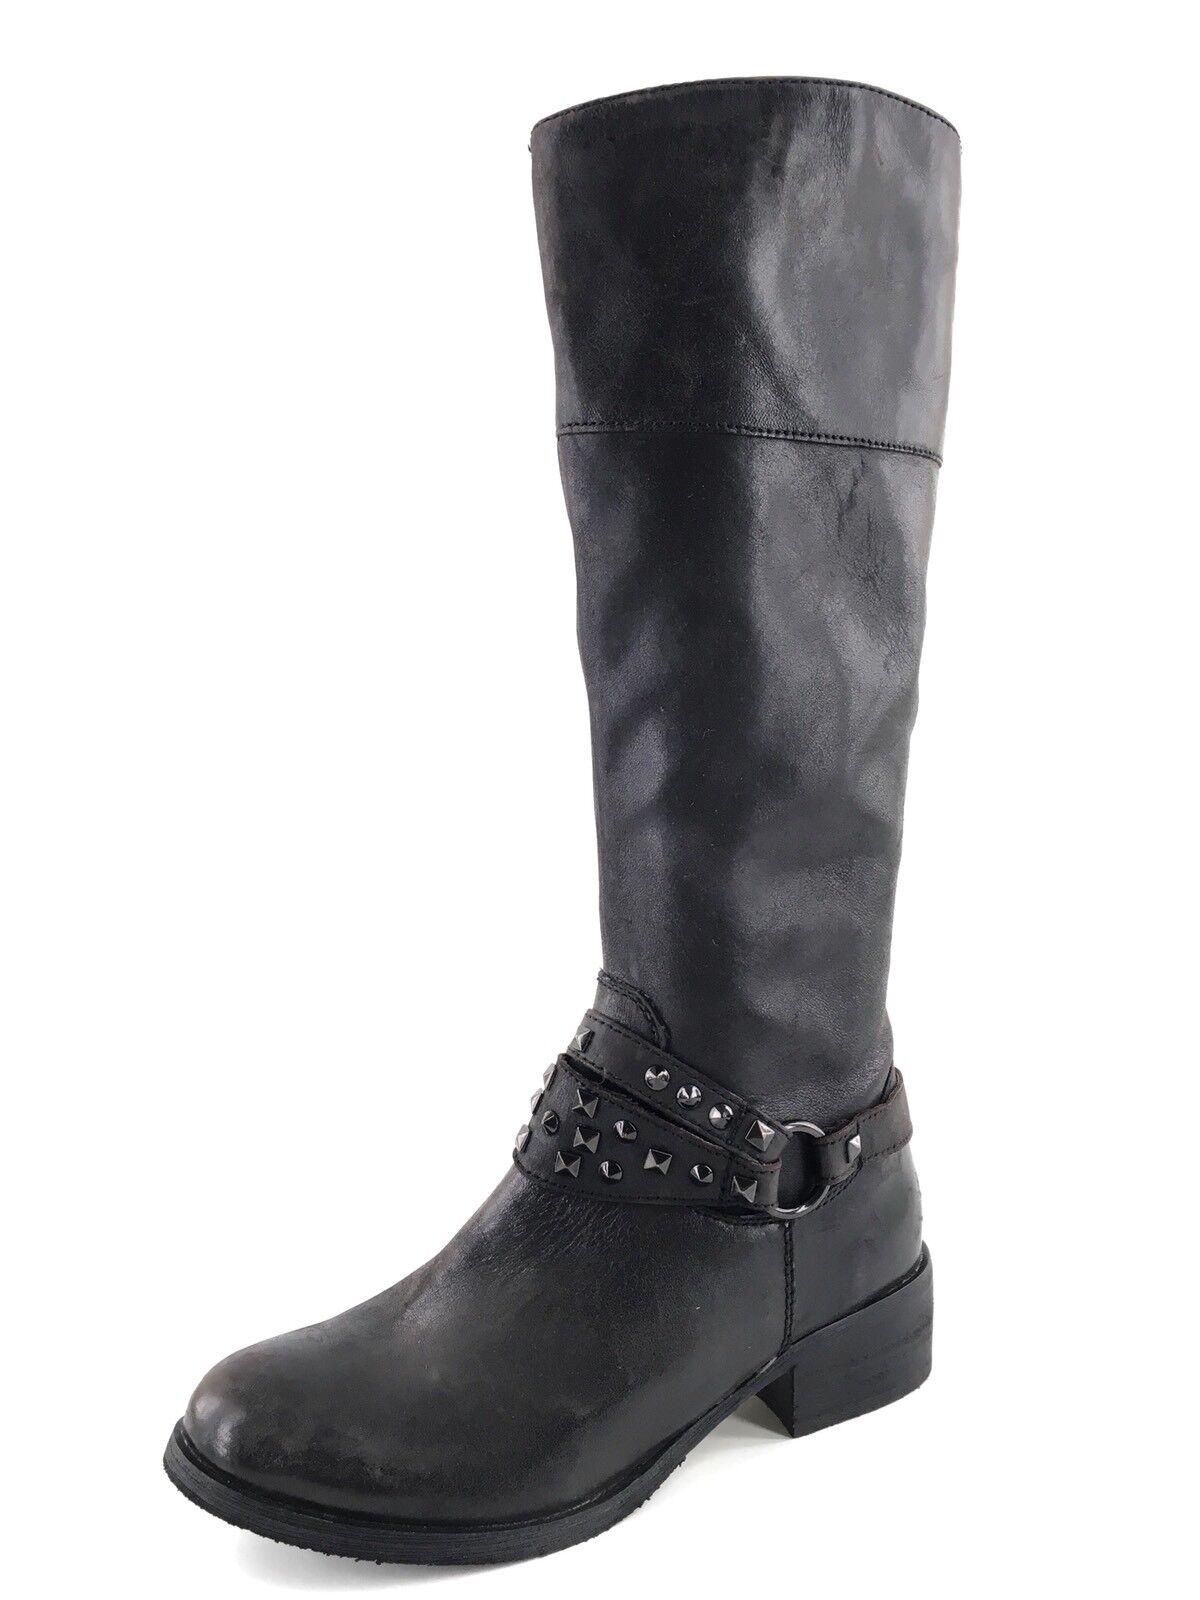 i nuovi marchi outlet online BP Bella nero Leather Knee High Studded Studded Studded Harness Riding stivali Donna  Dimensione 5 M   migliore qualità